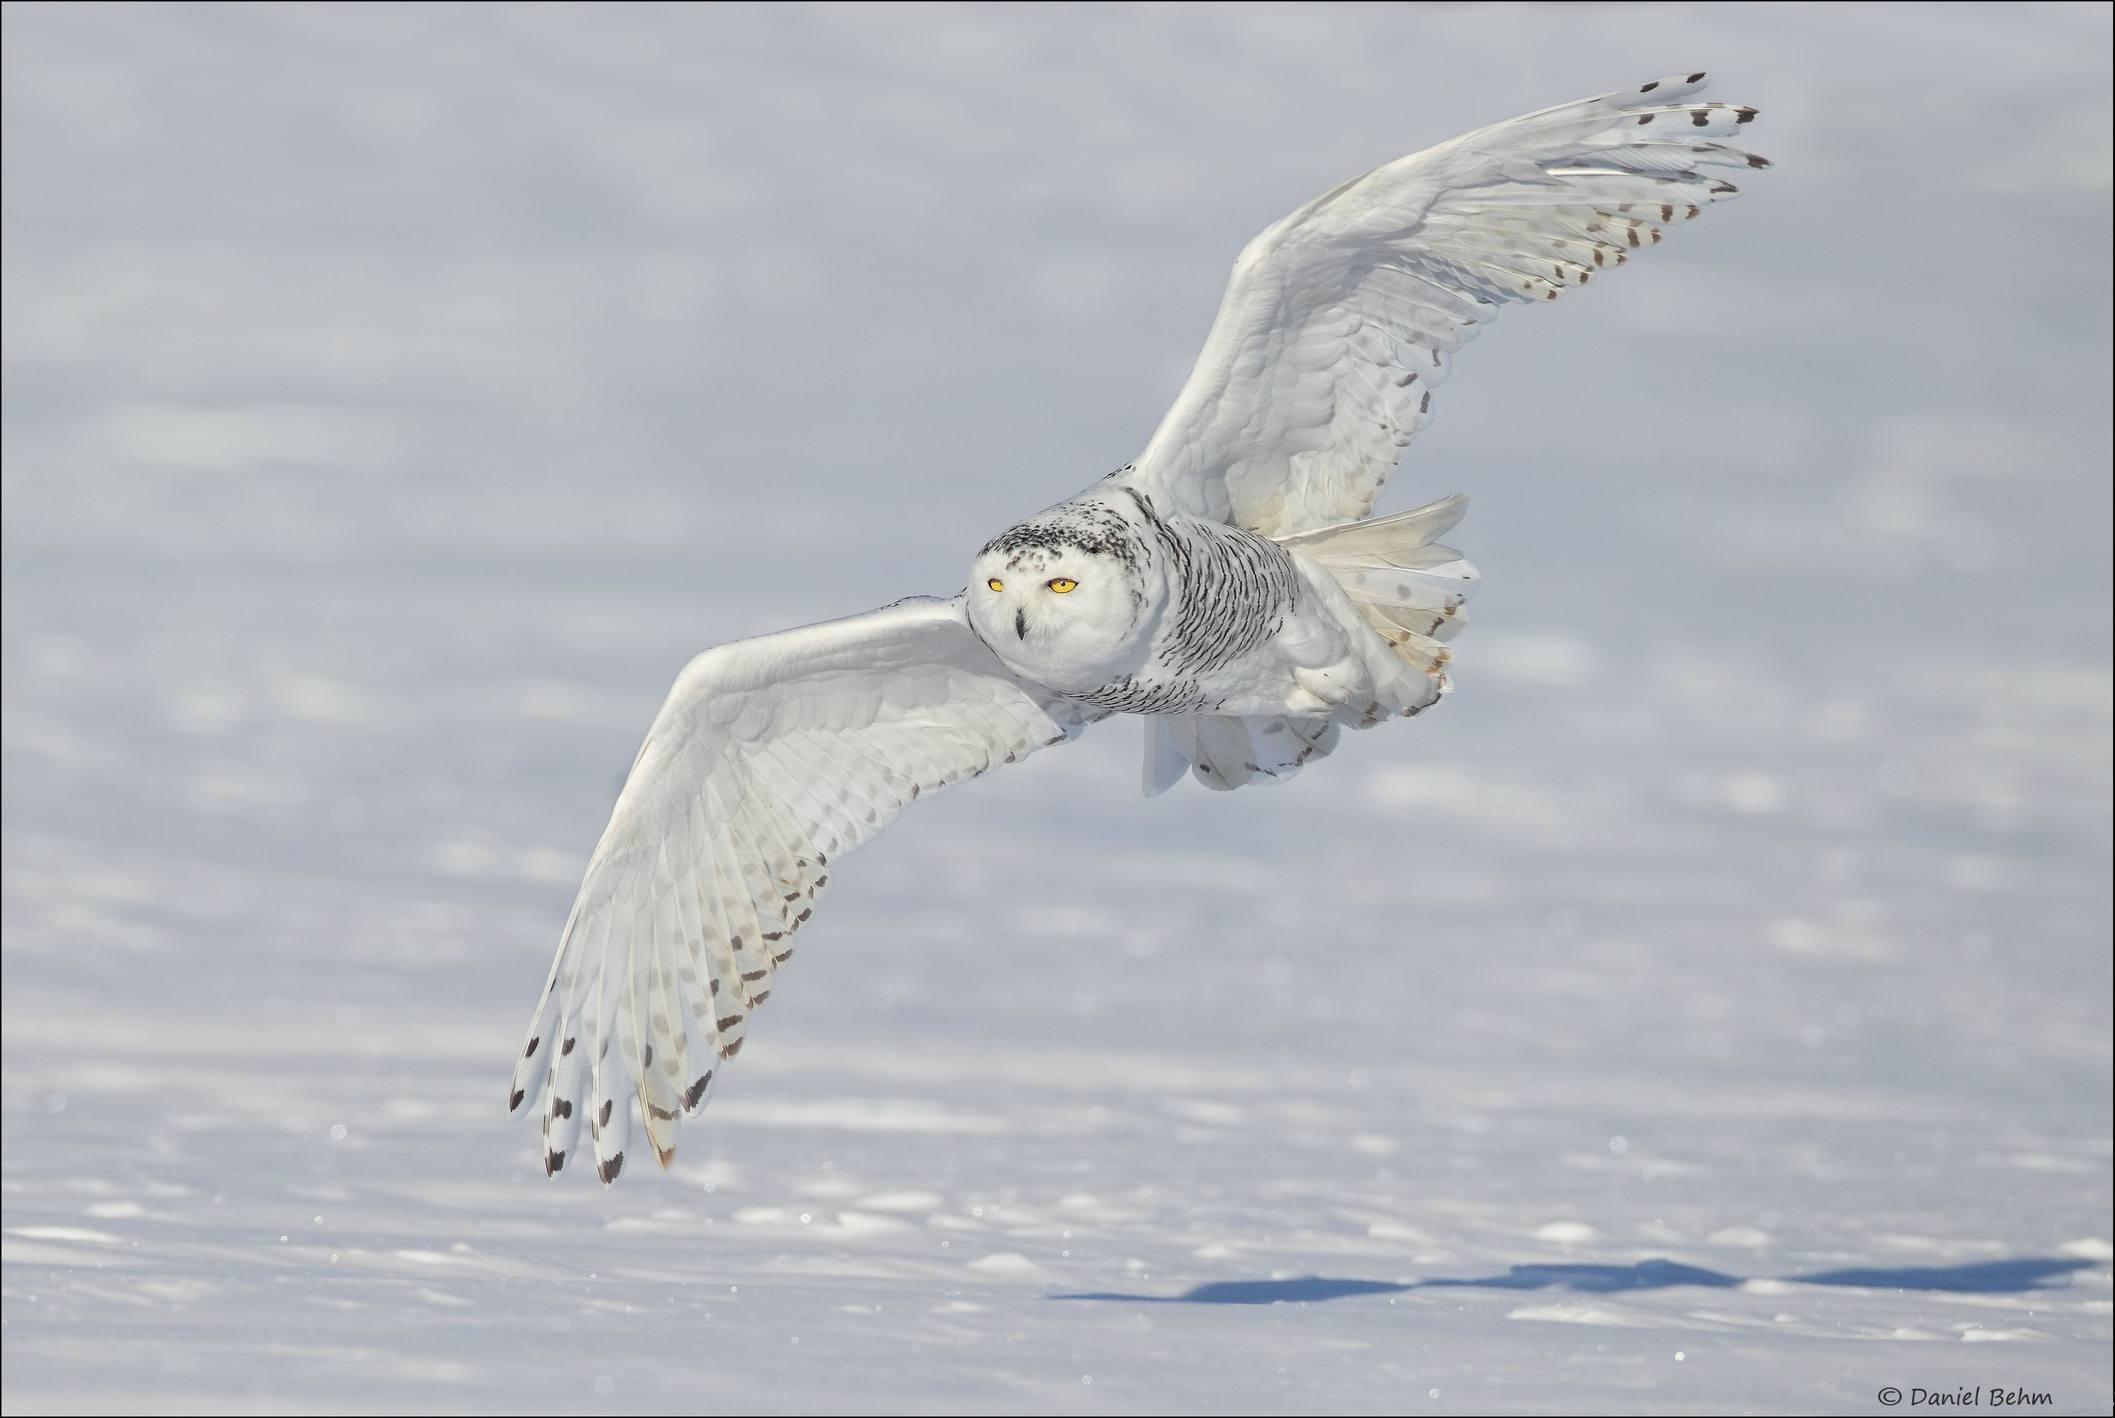 Snowy owl soaring over a winter landscape.